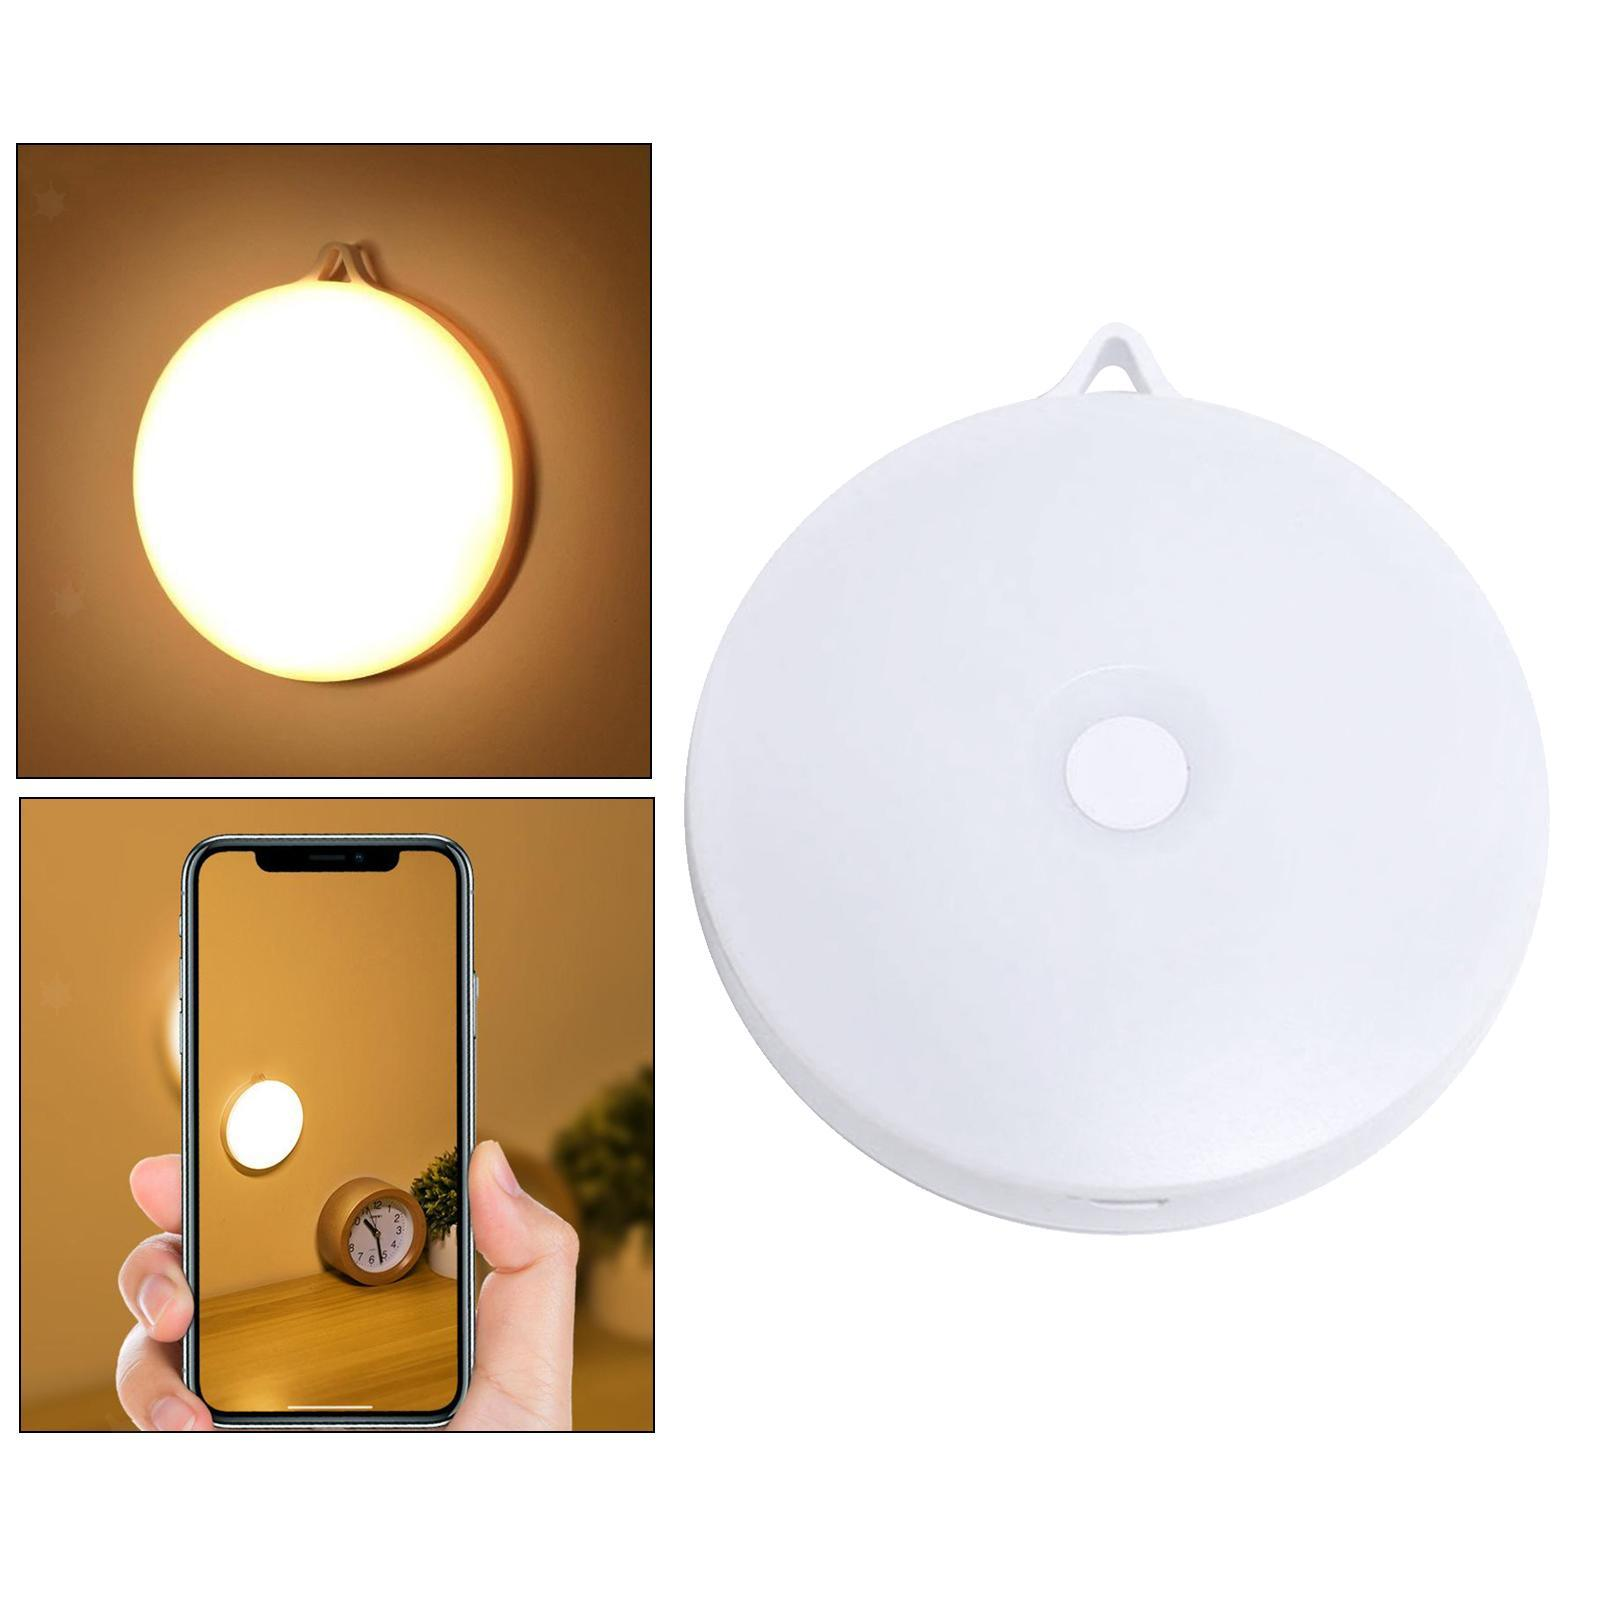 miniatura 13 - Luce notturna a LED per camera da letto ricaricabile USB per Hotel con sensore